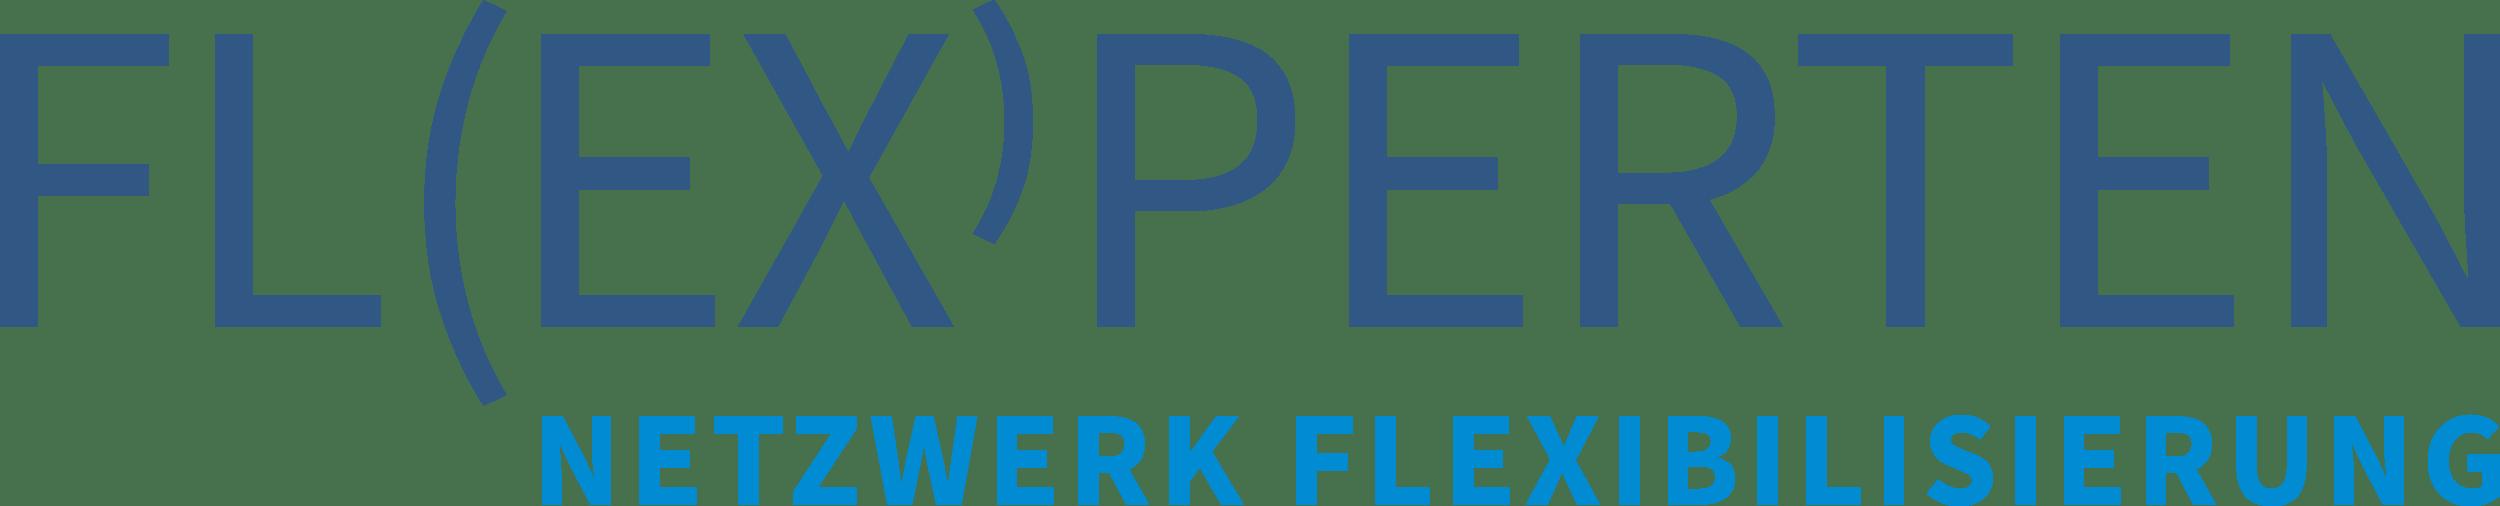 Netzwerk Flexperten  meta-i.d. Ökologische Innovation GmbH